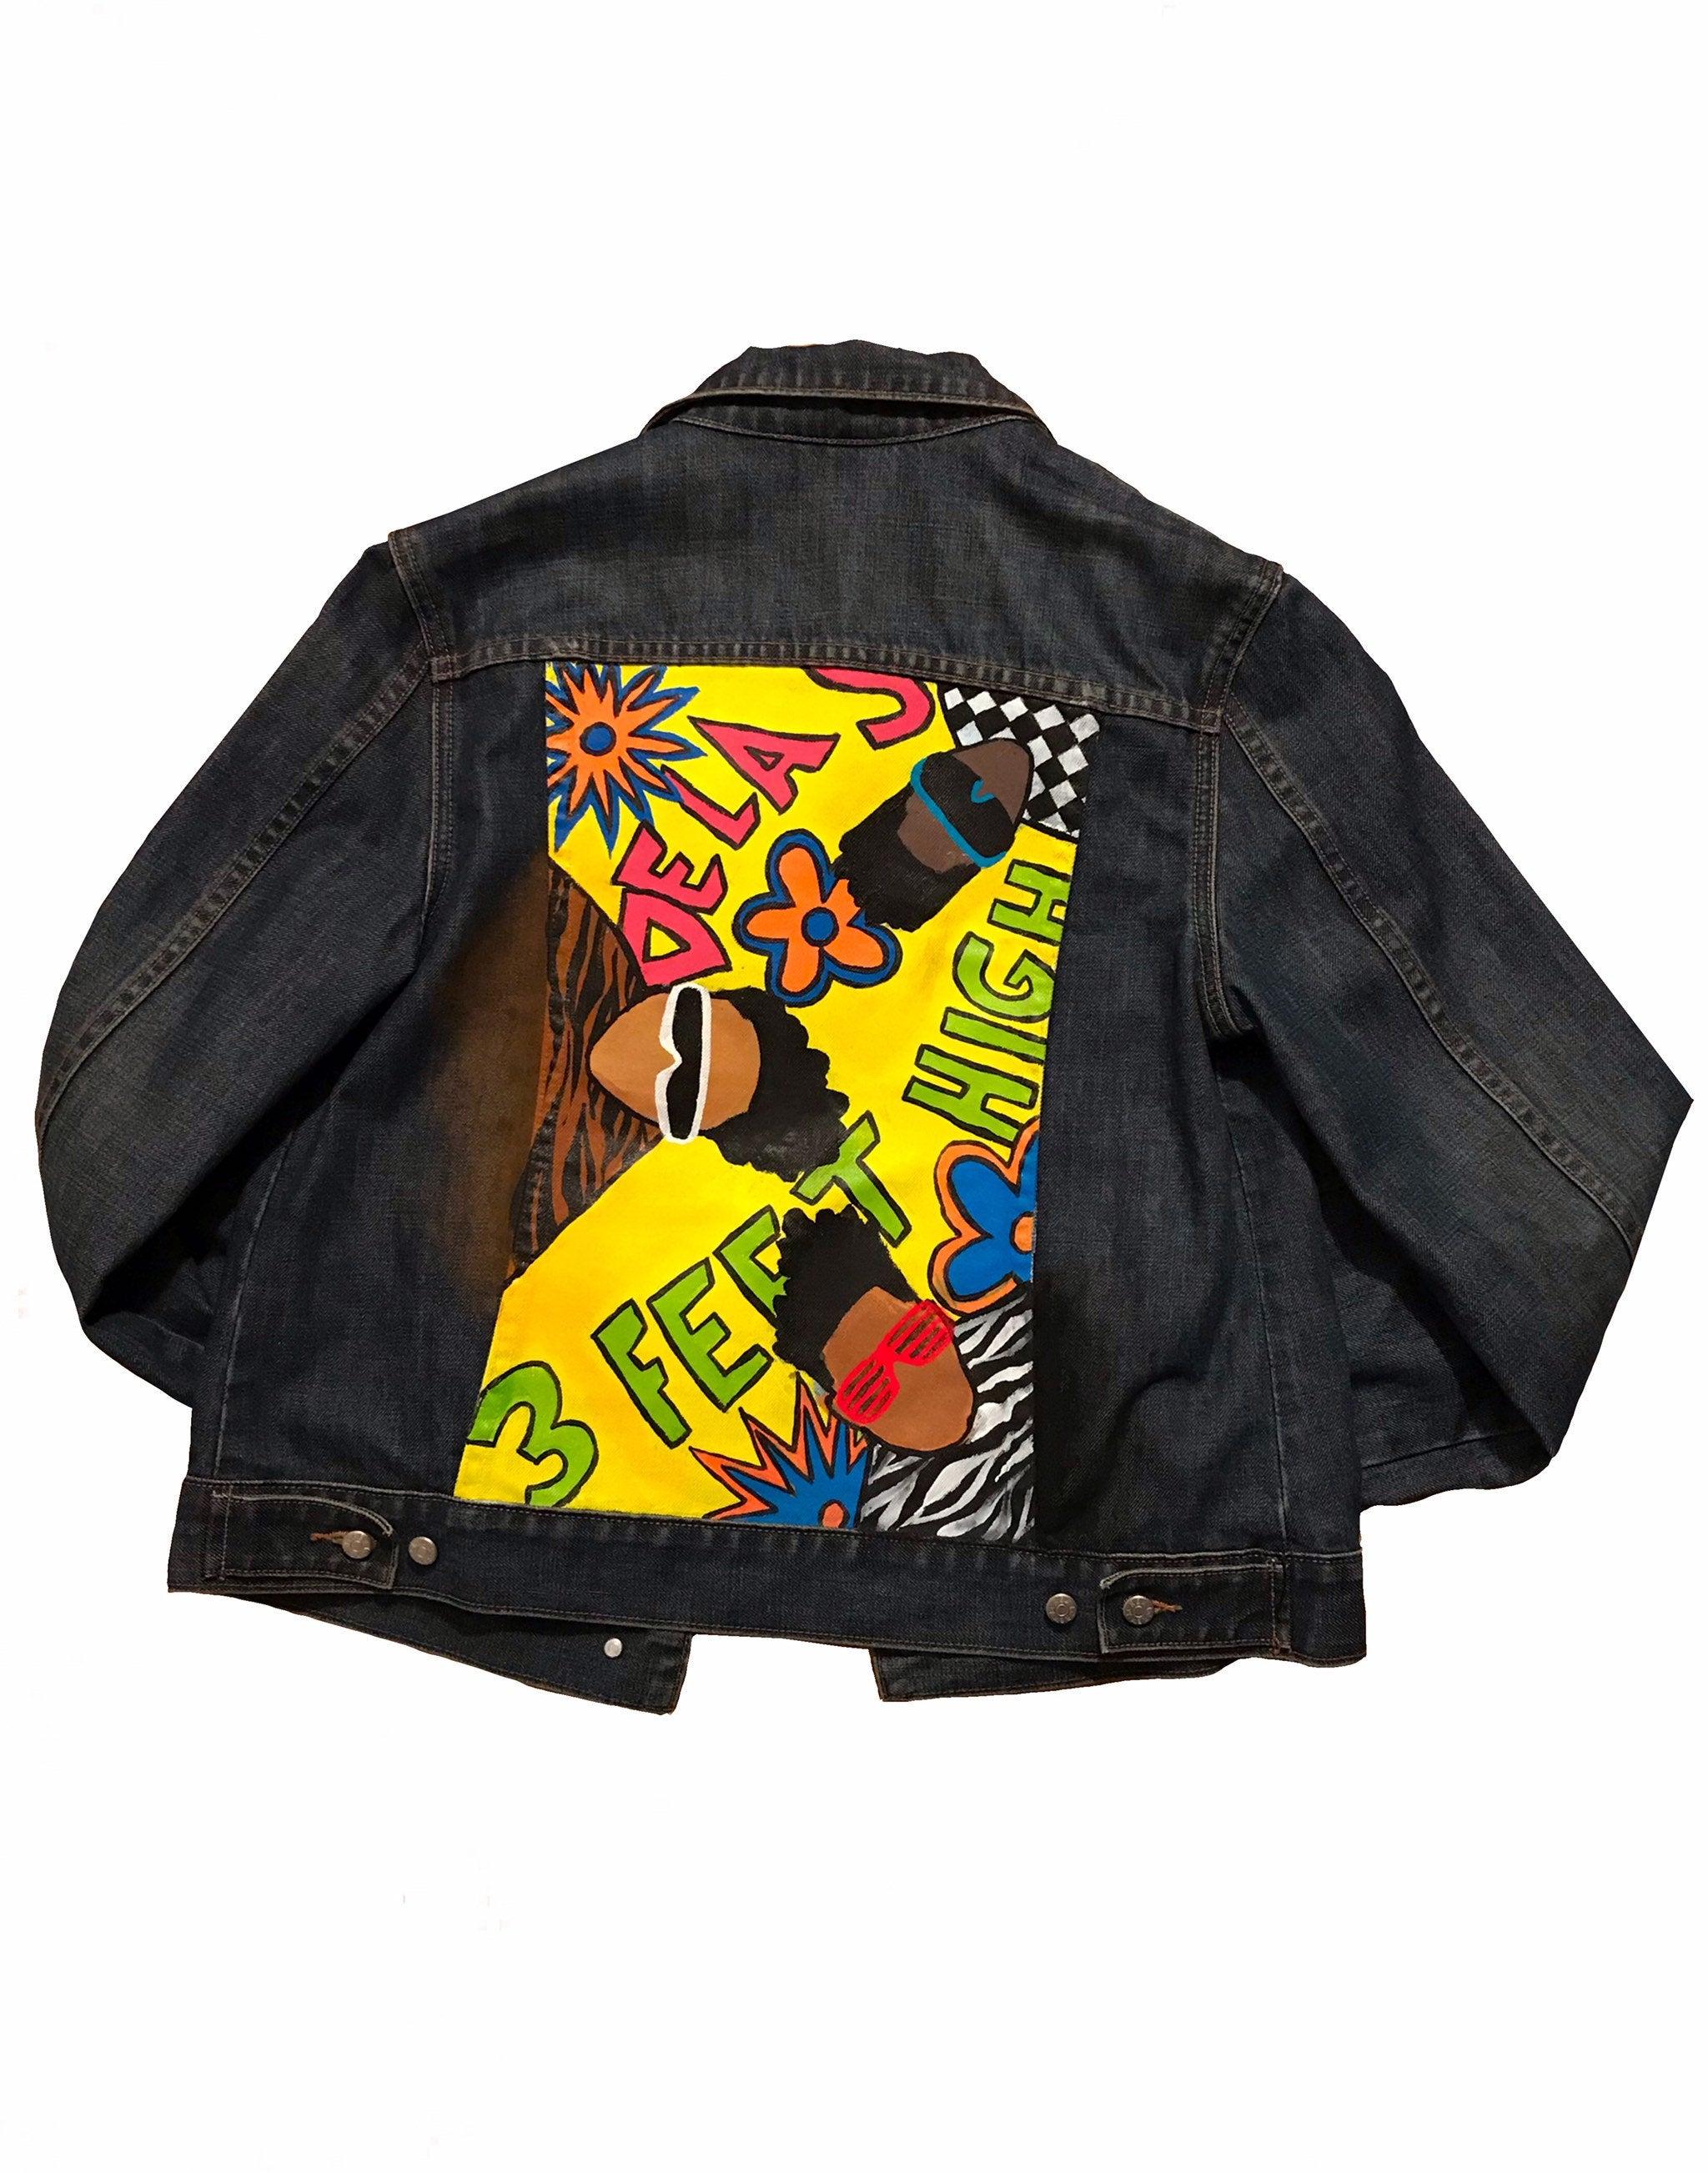 dawood_marion_jacket001.jpg